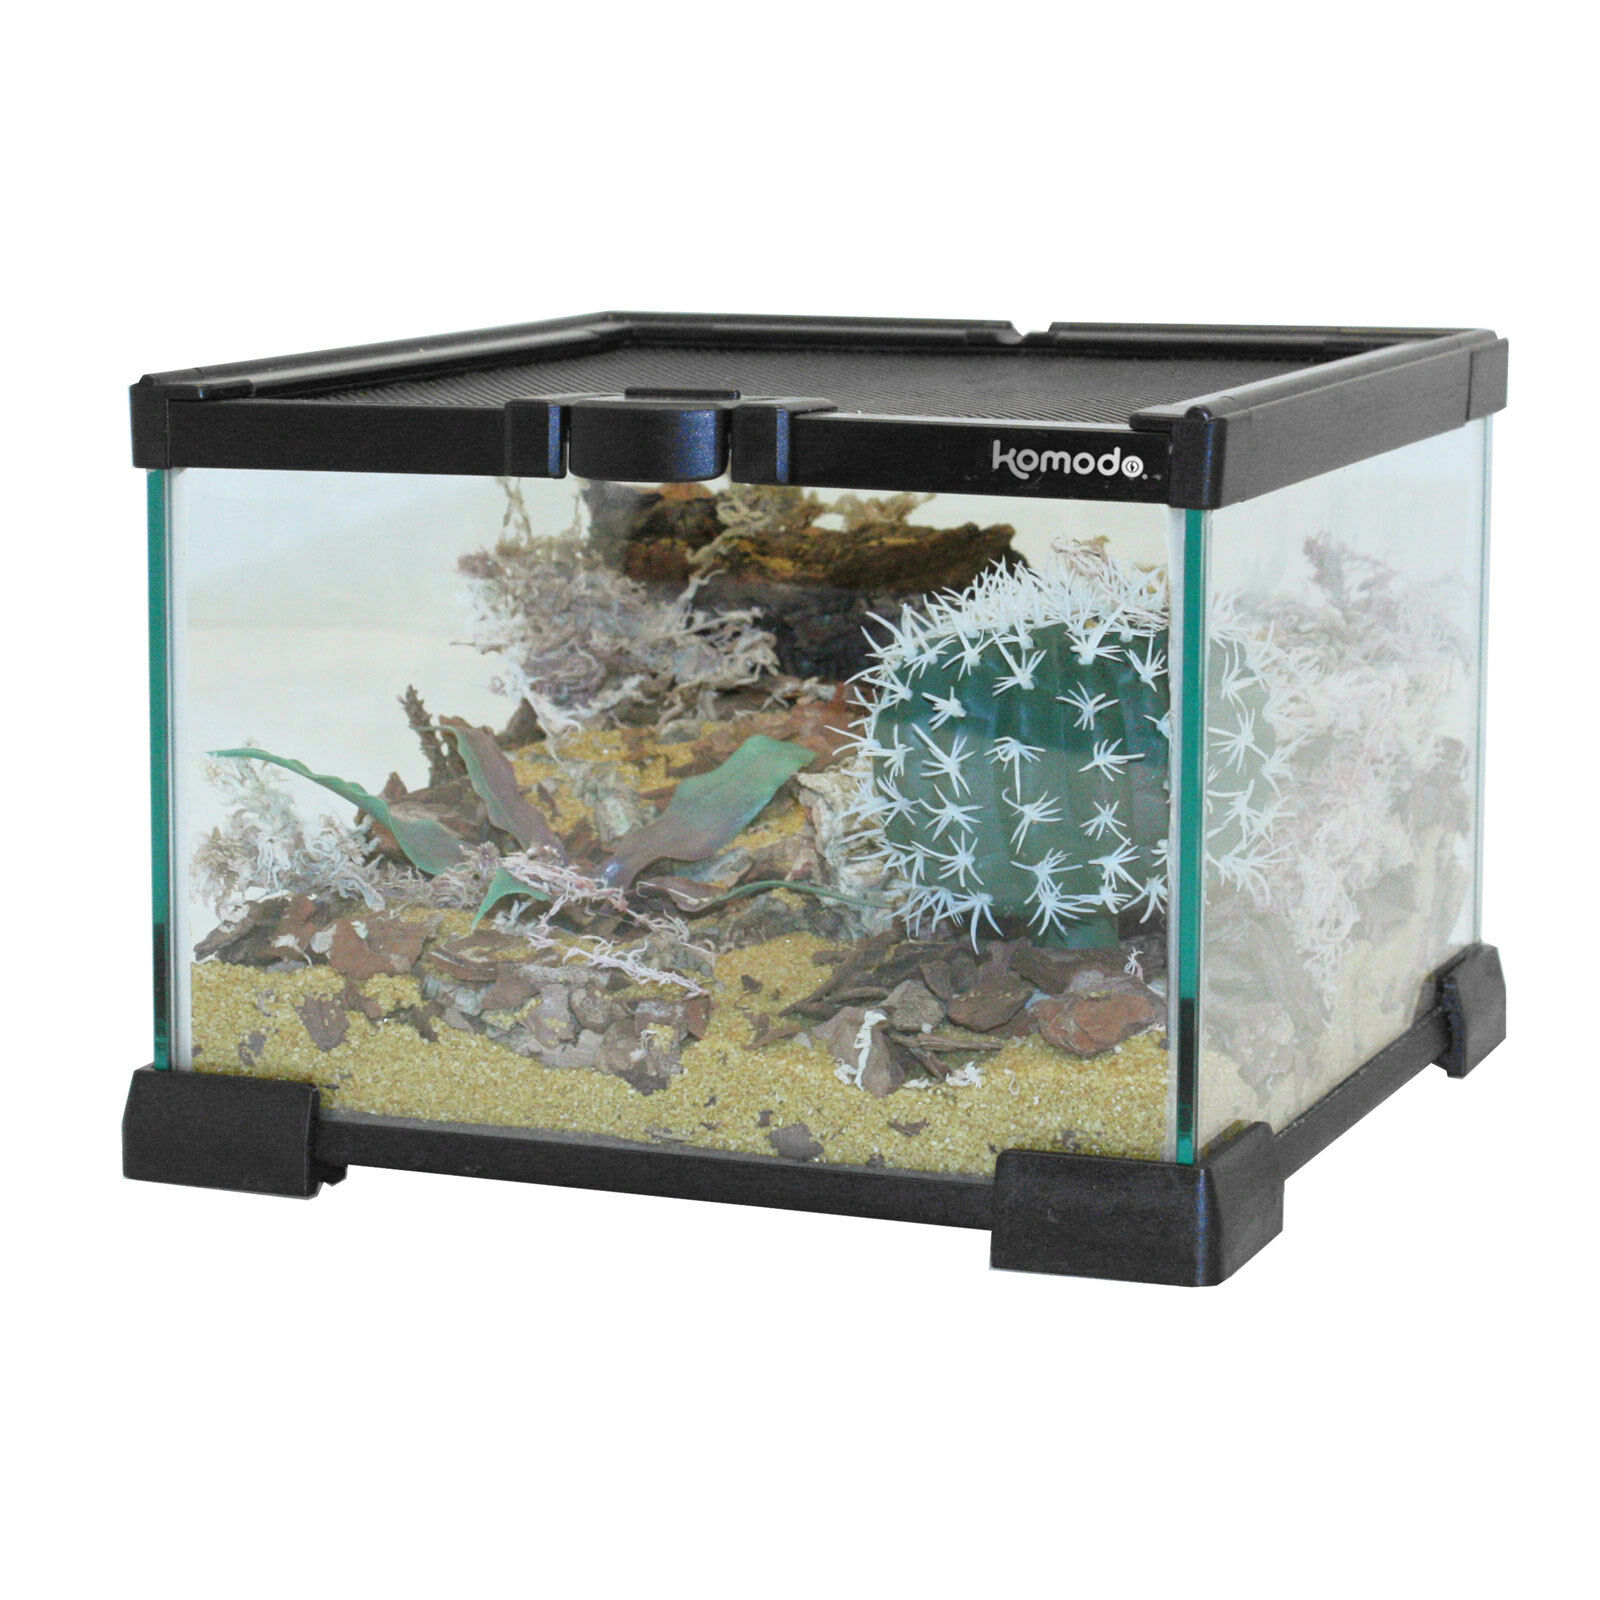 Nano Habitat terrario Spider insetti Frog-vetro, impilabile - 21 x 21 x 15cm